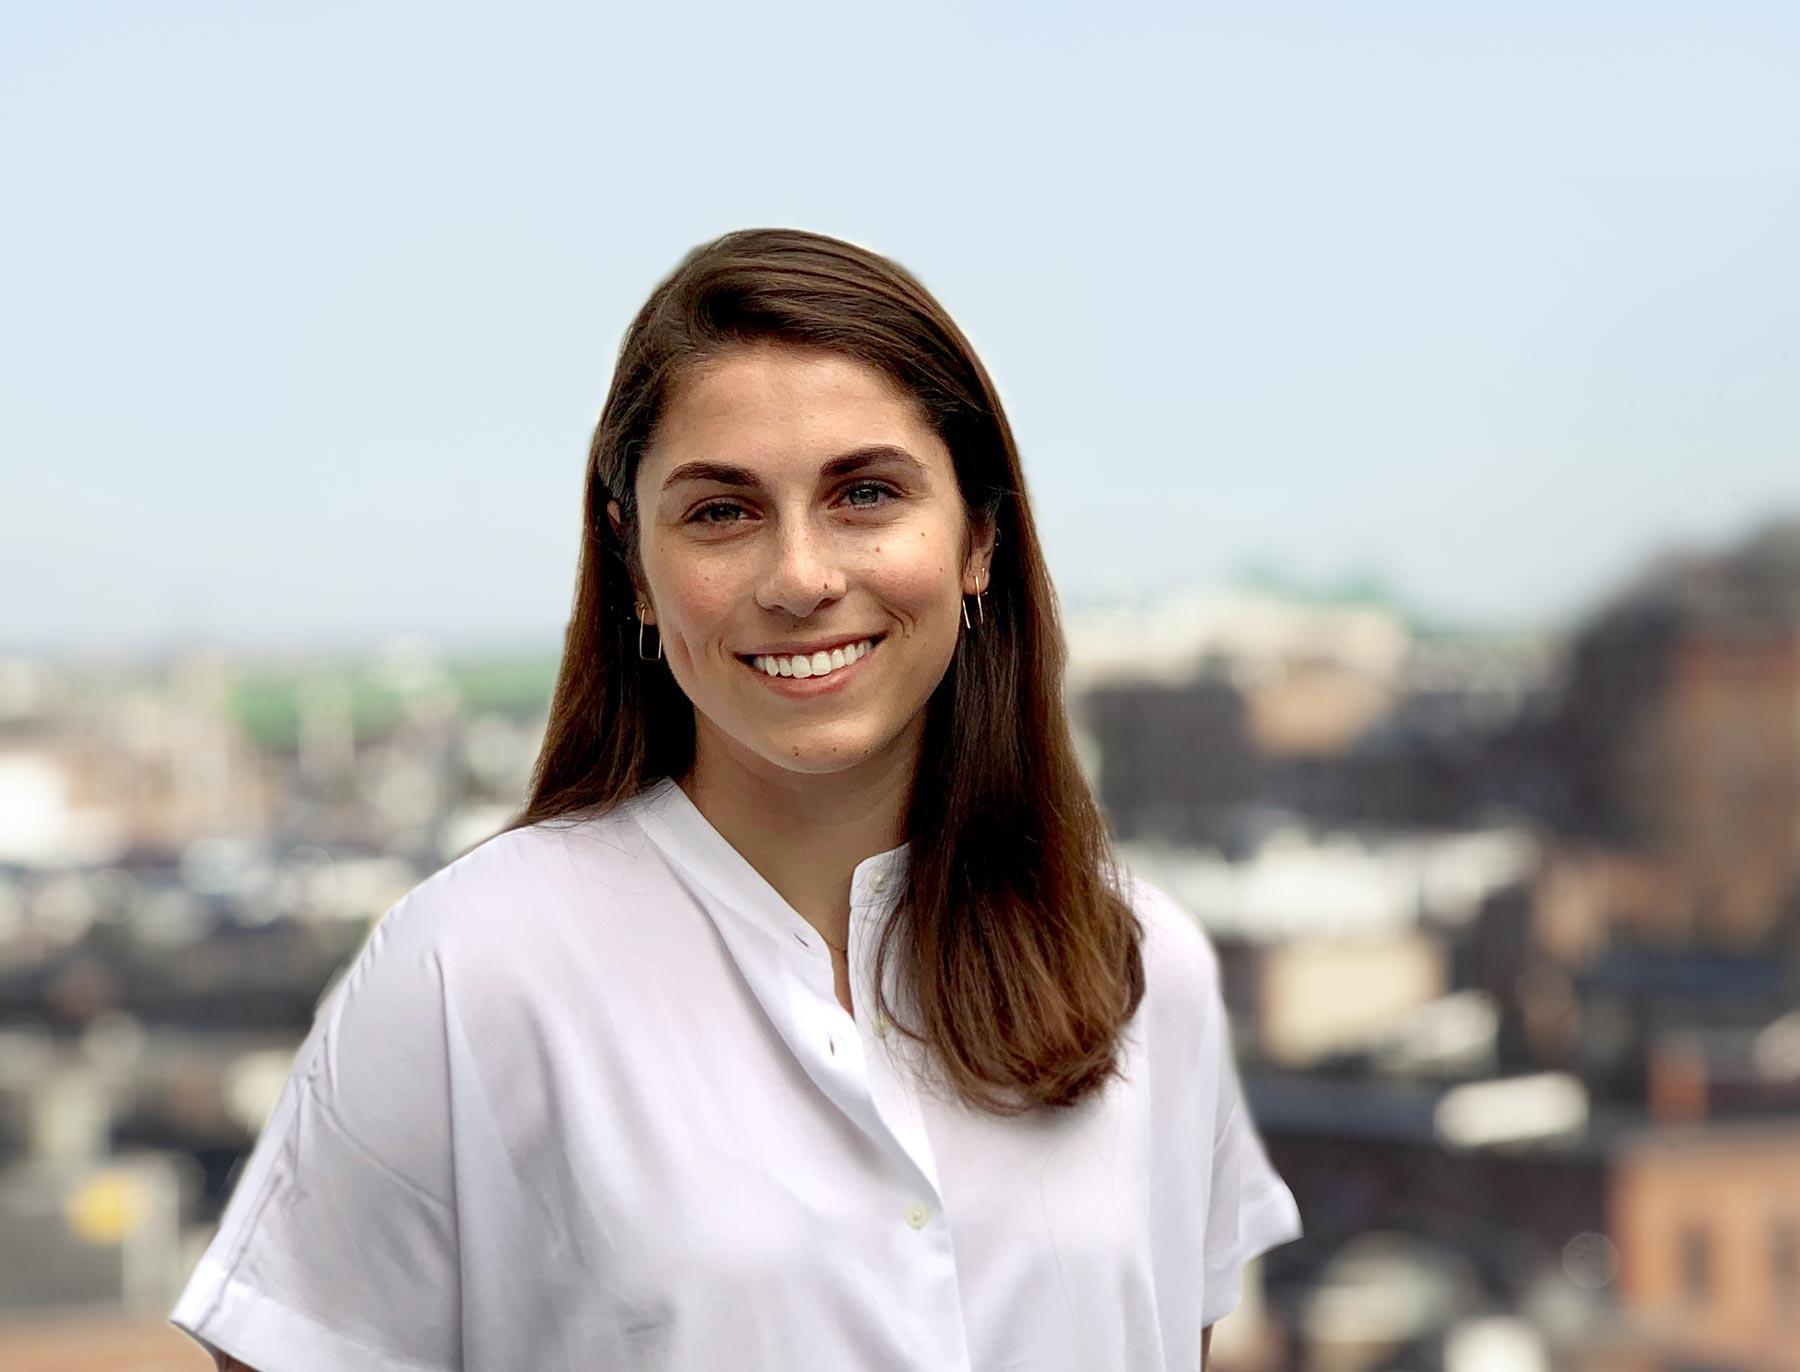 Allison Rutz